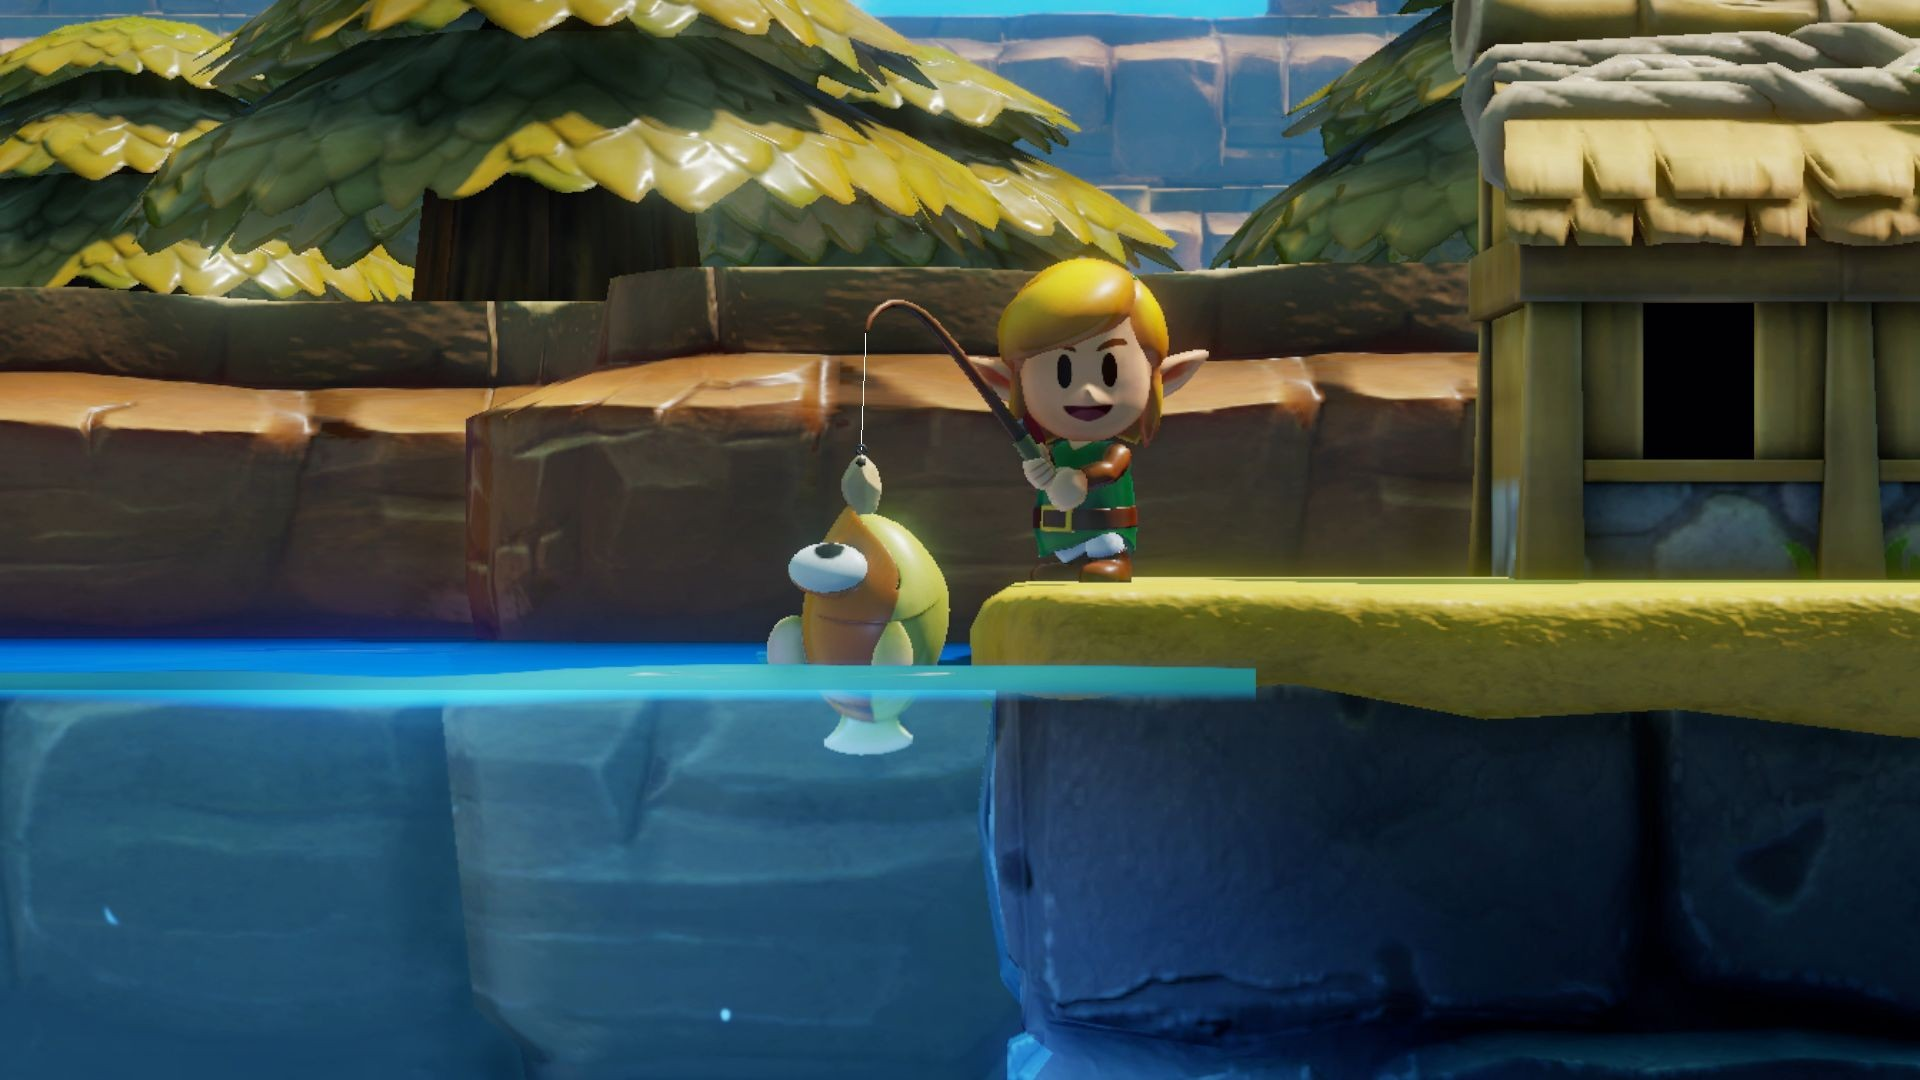 Nintendo выпустила обзорный трейлер The Legend of Zelda: Link's Awakening